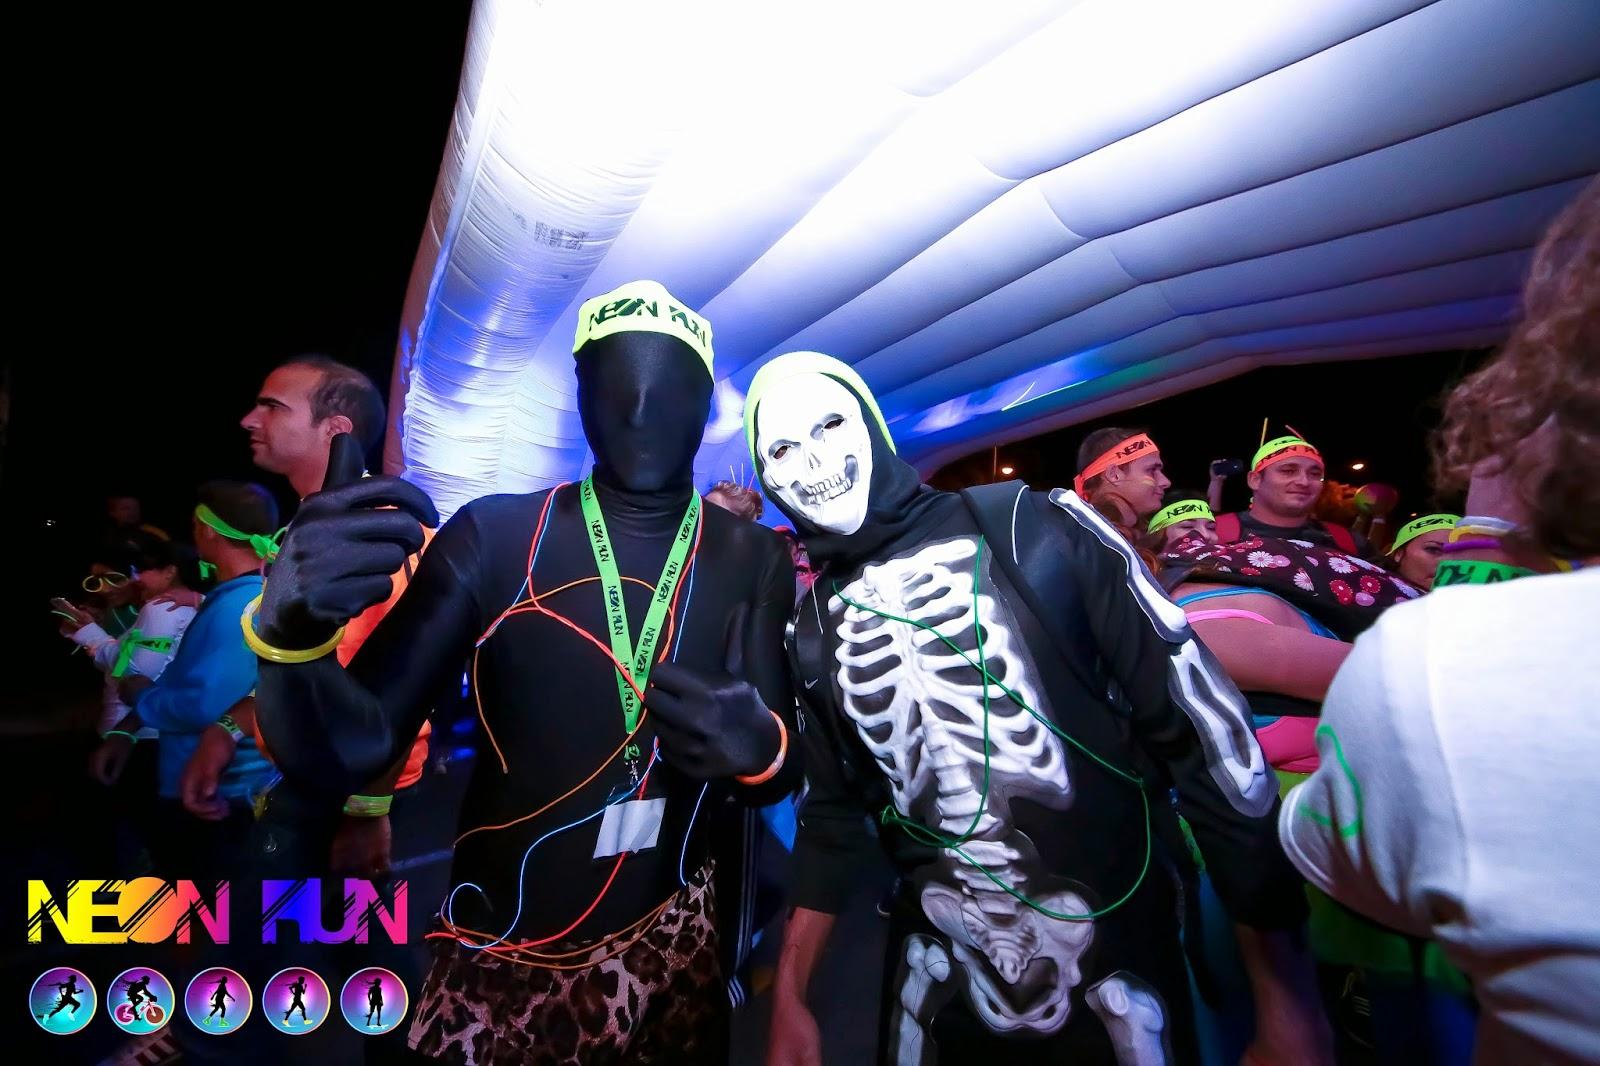 neon run 2015 south africa